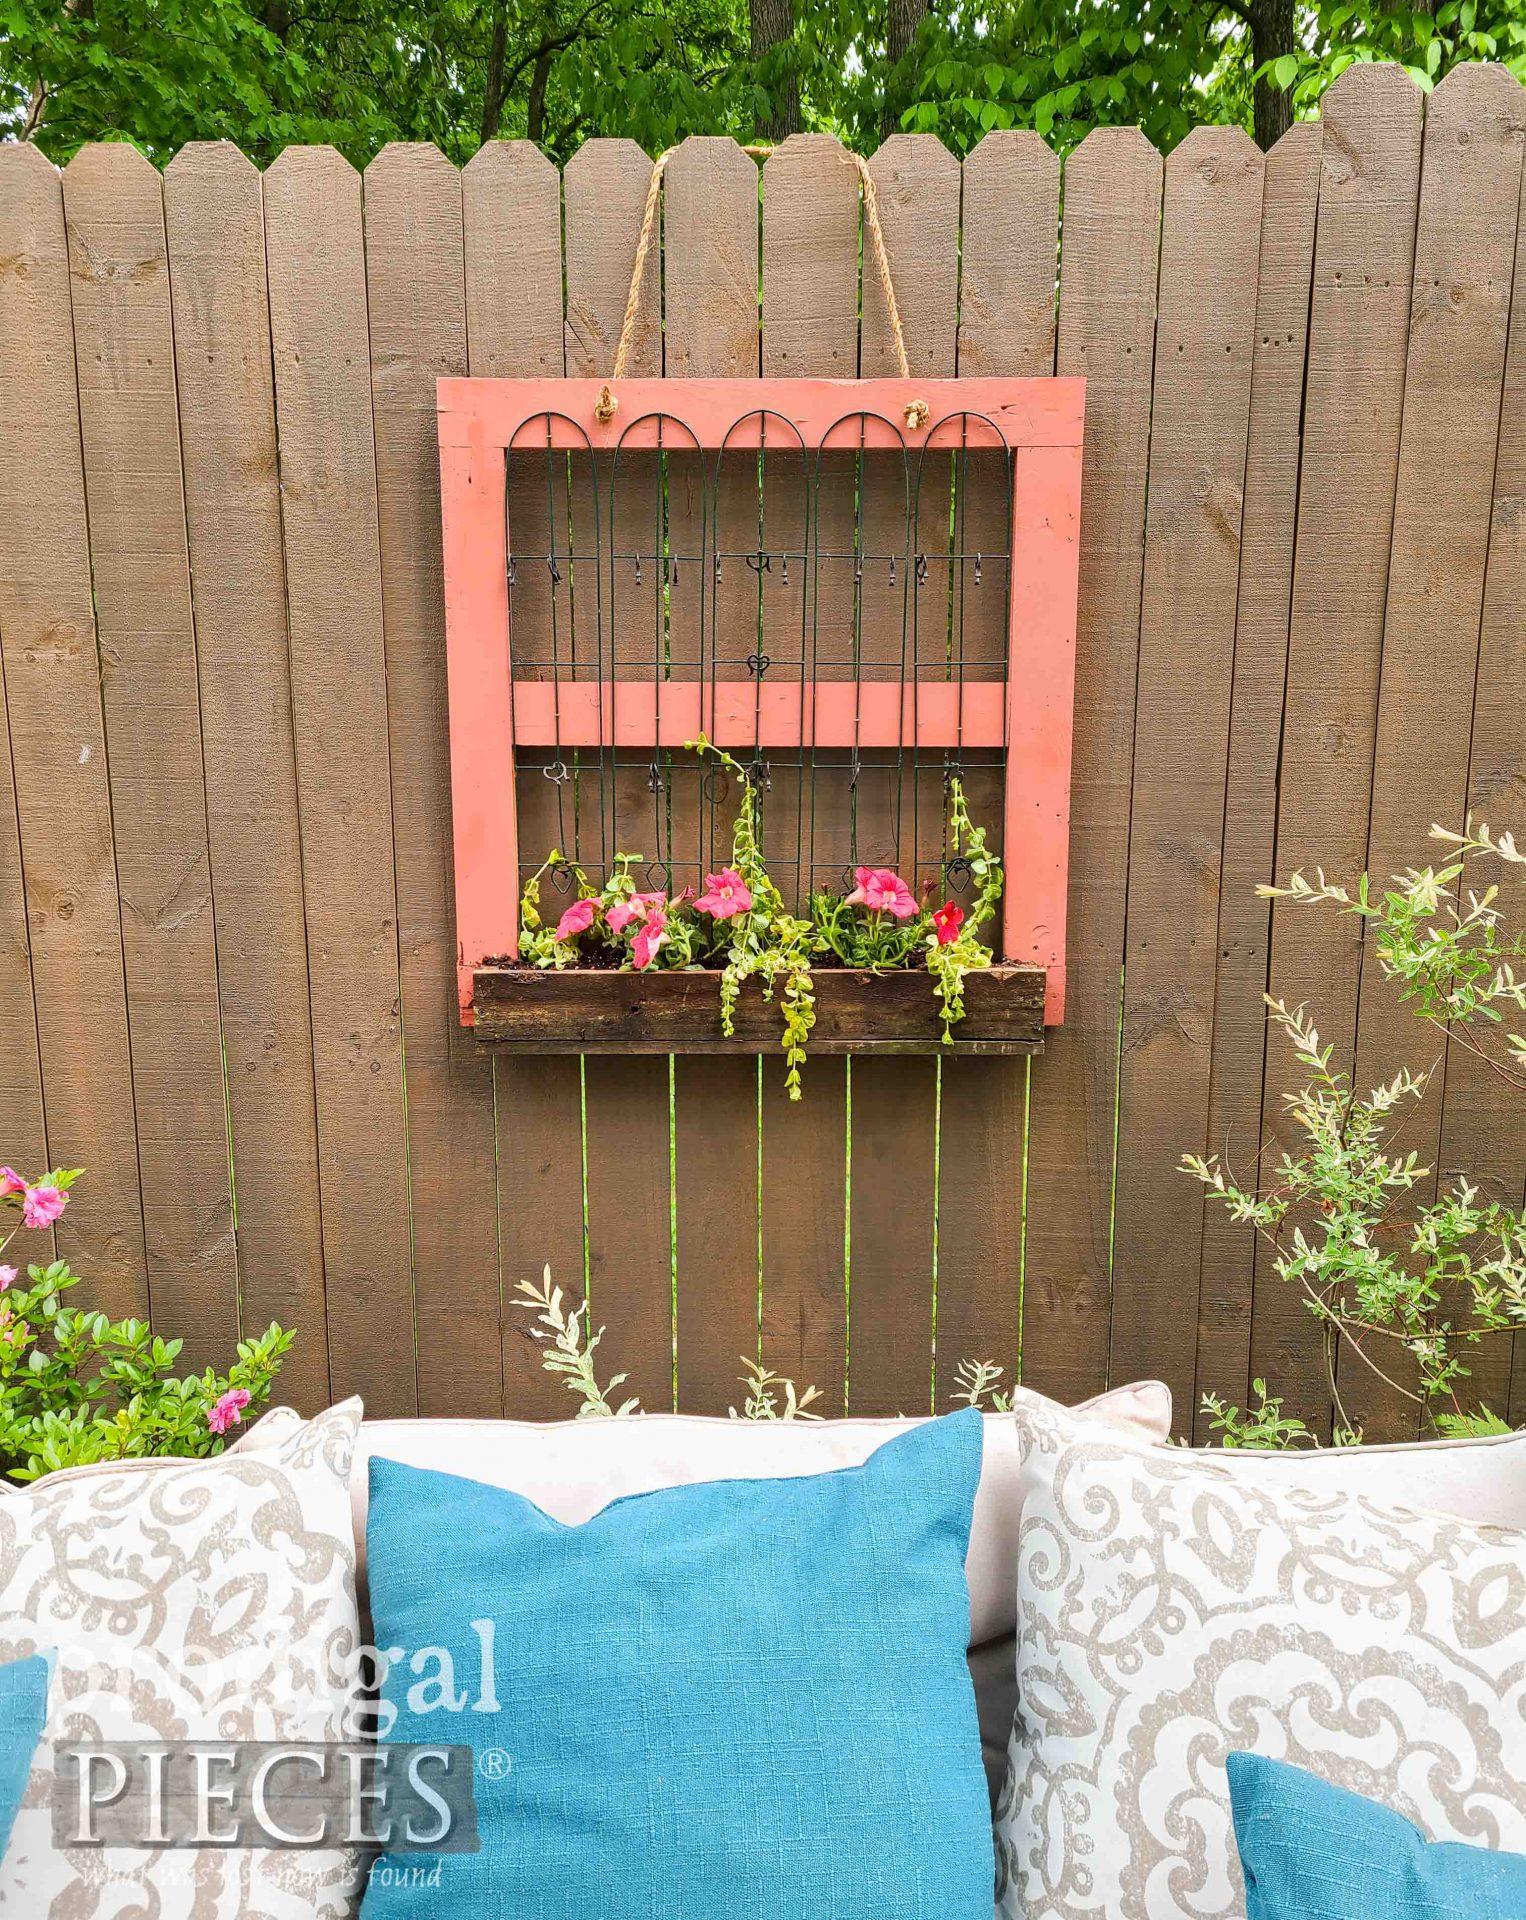 DIY Flower Hanging Fence Planter by Larissa of Prodigal Pieces | prodigalpieces.com #prodigalpieces #home #garden #diy #flowers